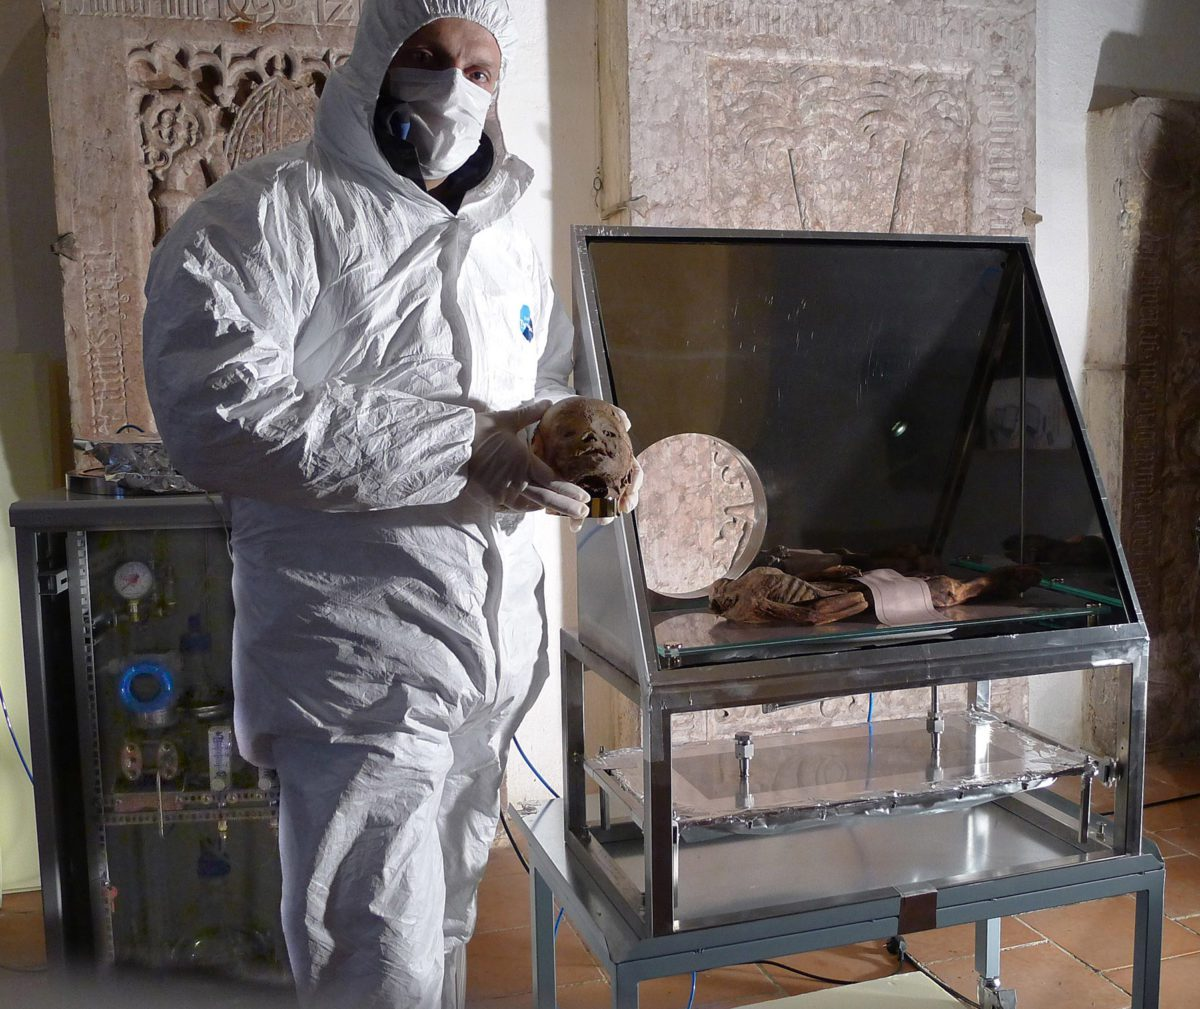 Svelati enigmi su alcune antiche mummie